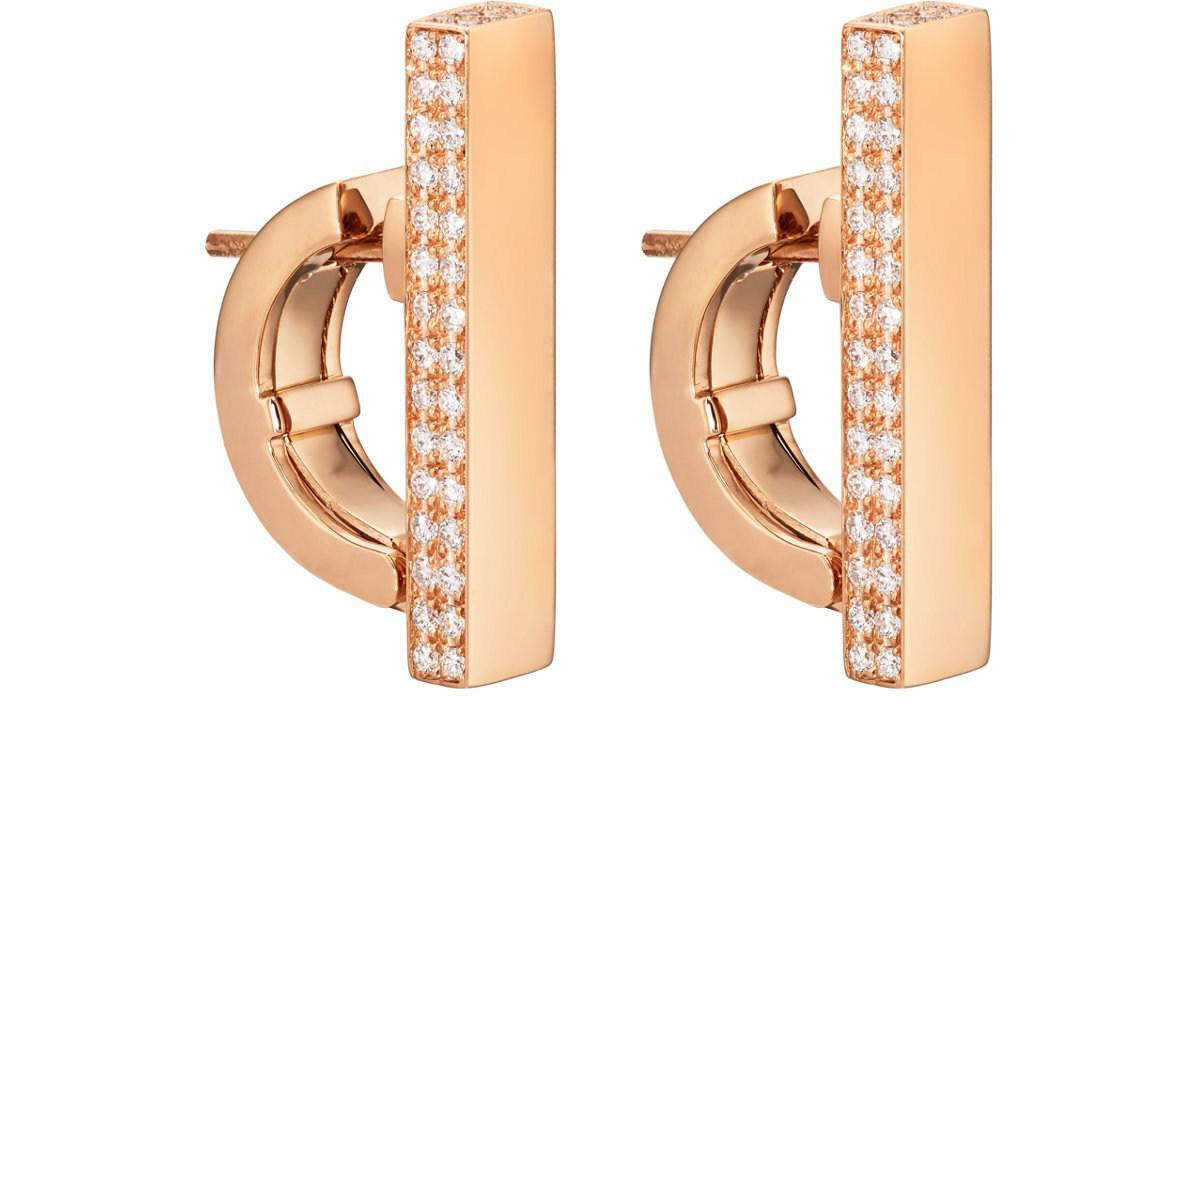 Dauphin Womens Bar Earrings 27bKsUes